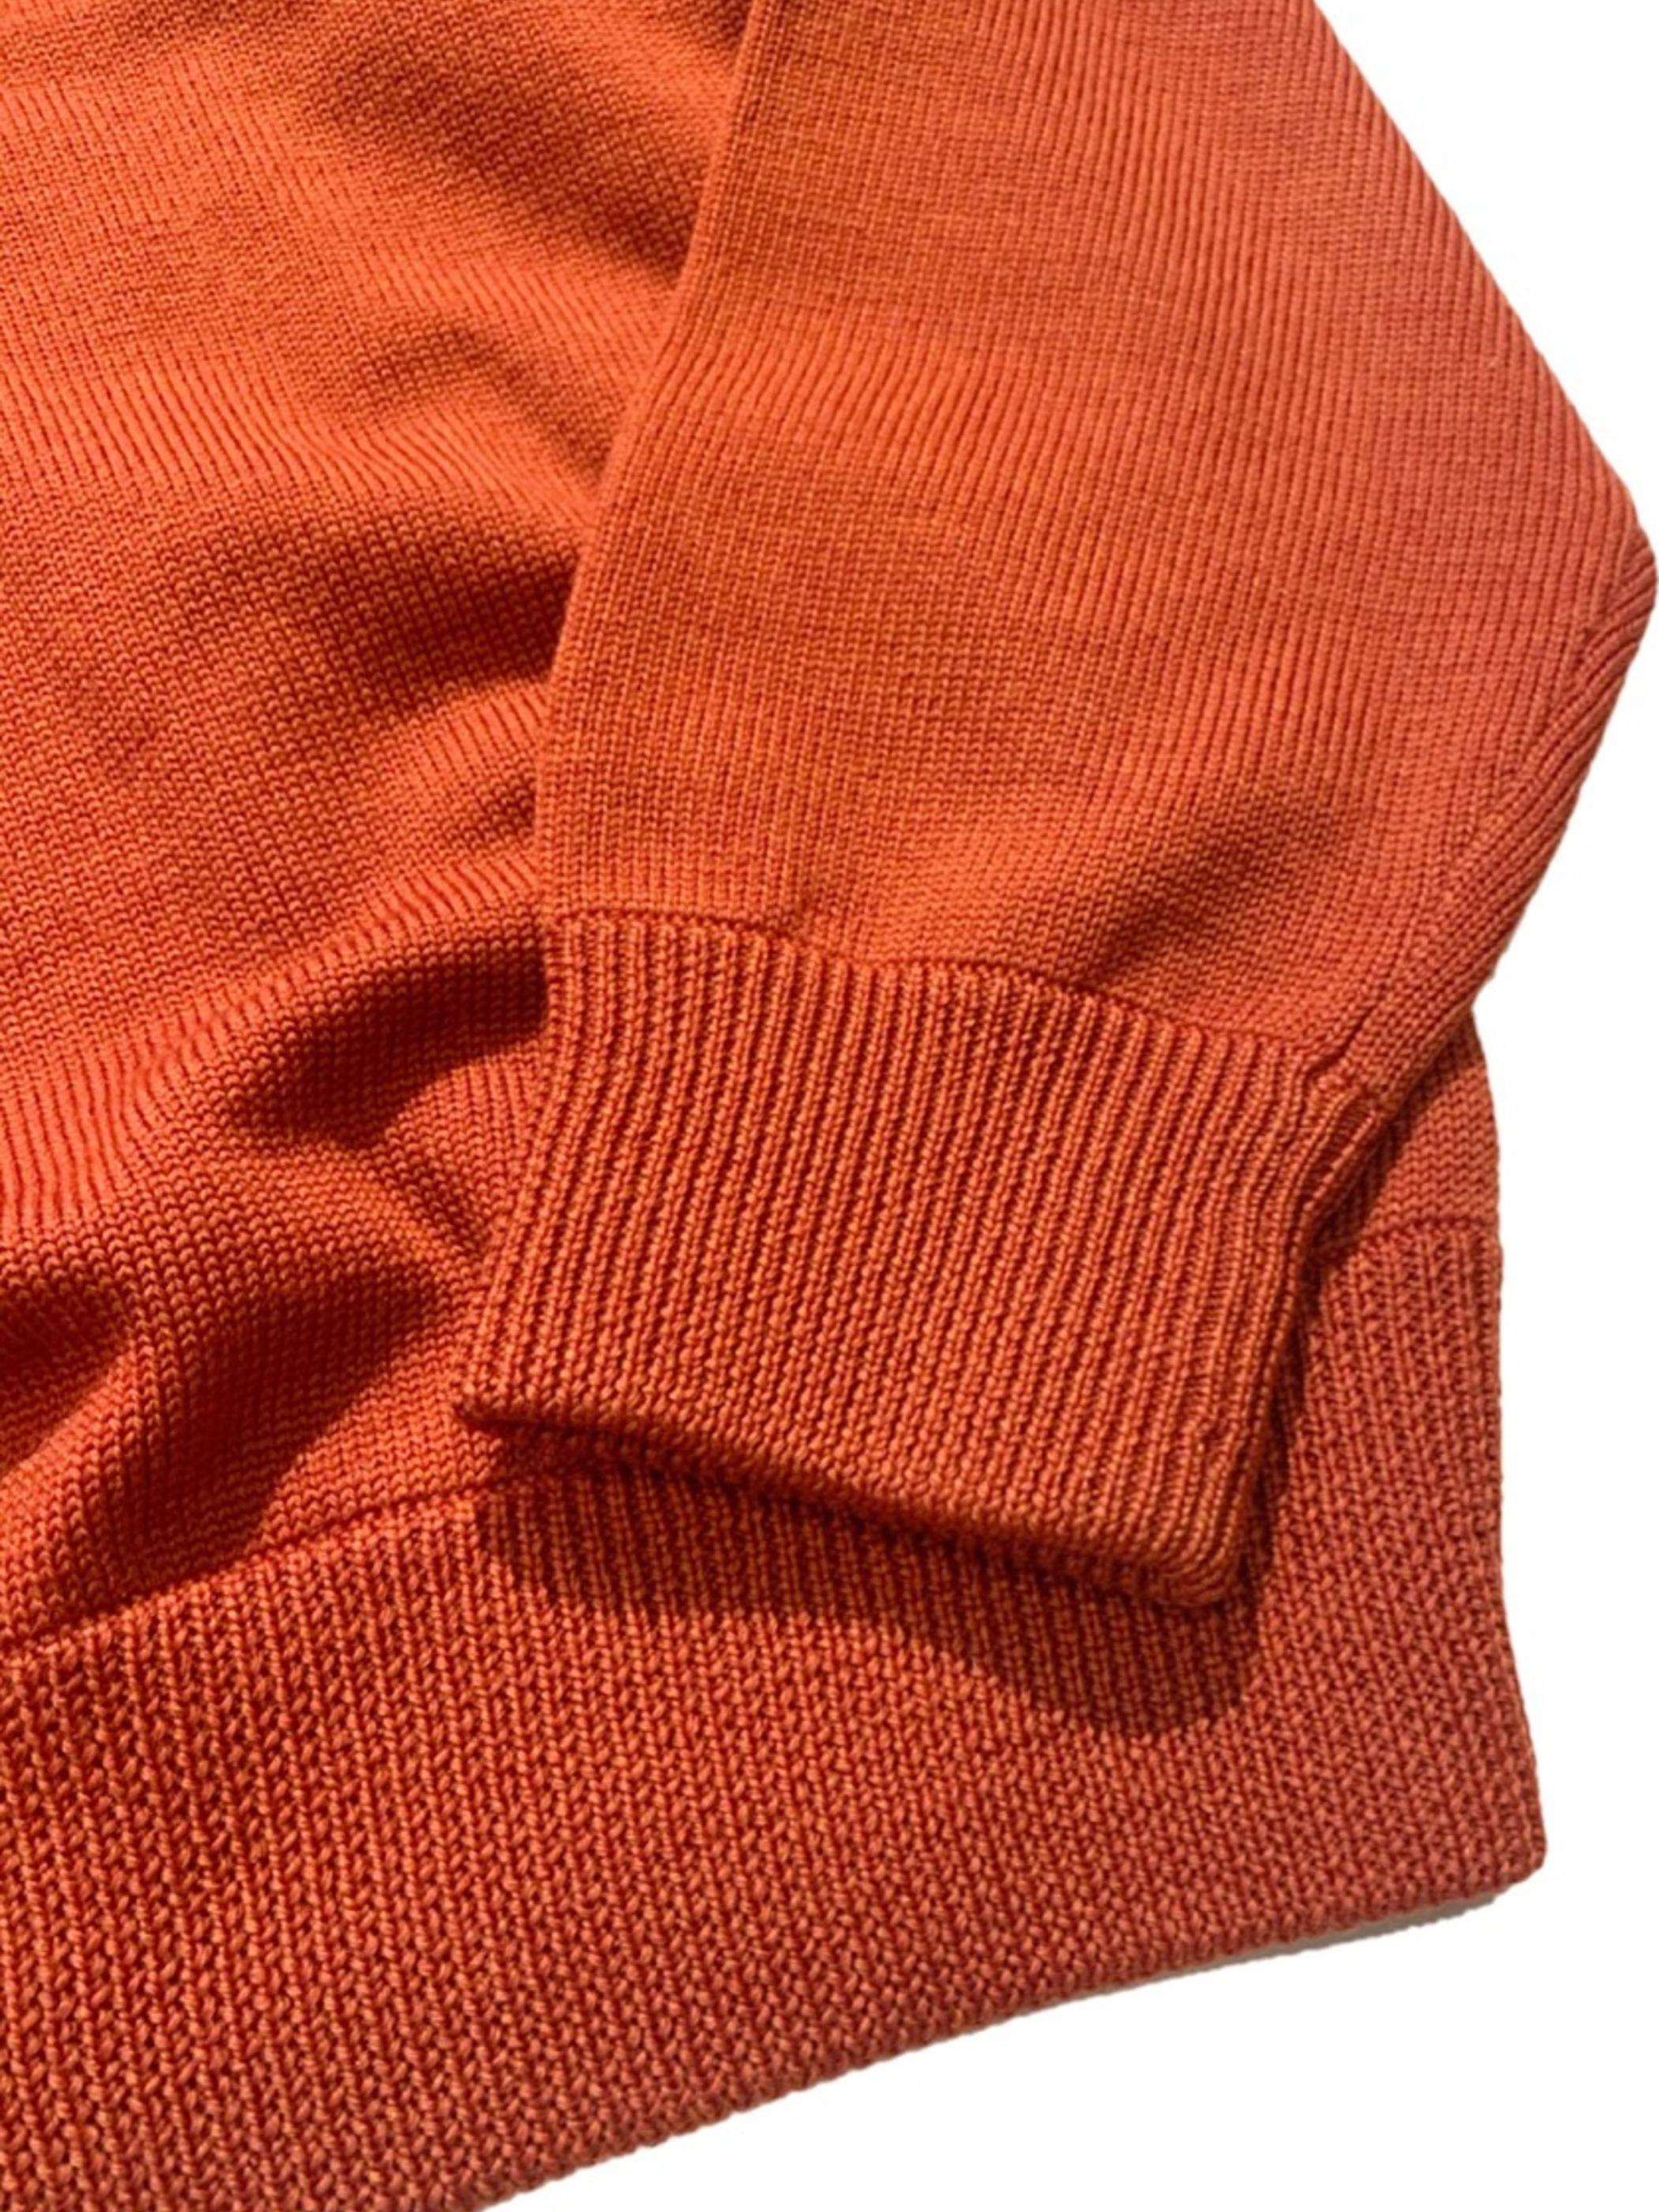 Brooks Brothers cotton knit